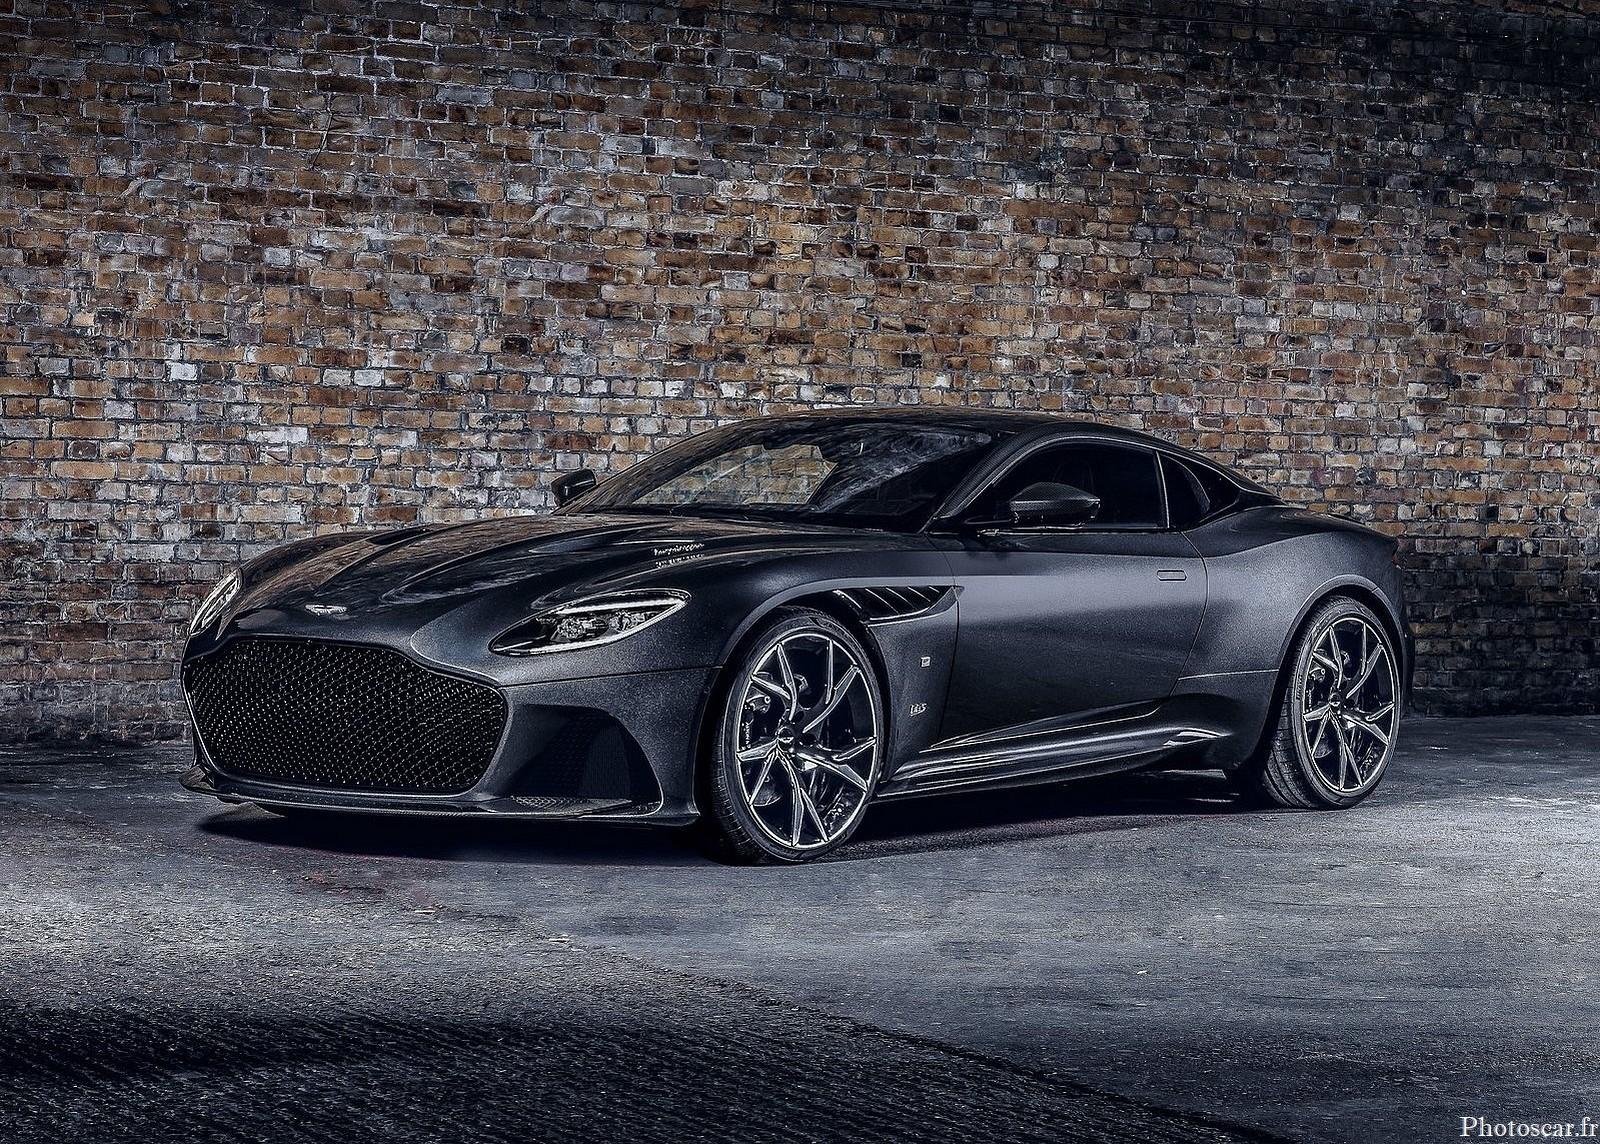 Aston Martin DBS Superleggera 007 édition 2021